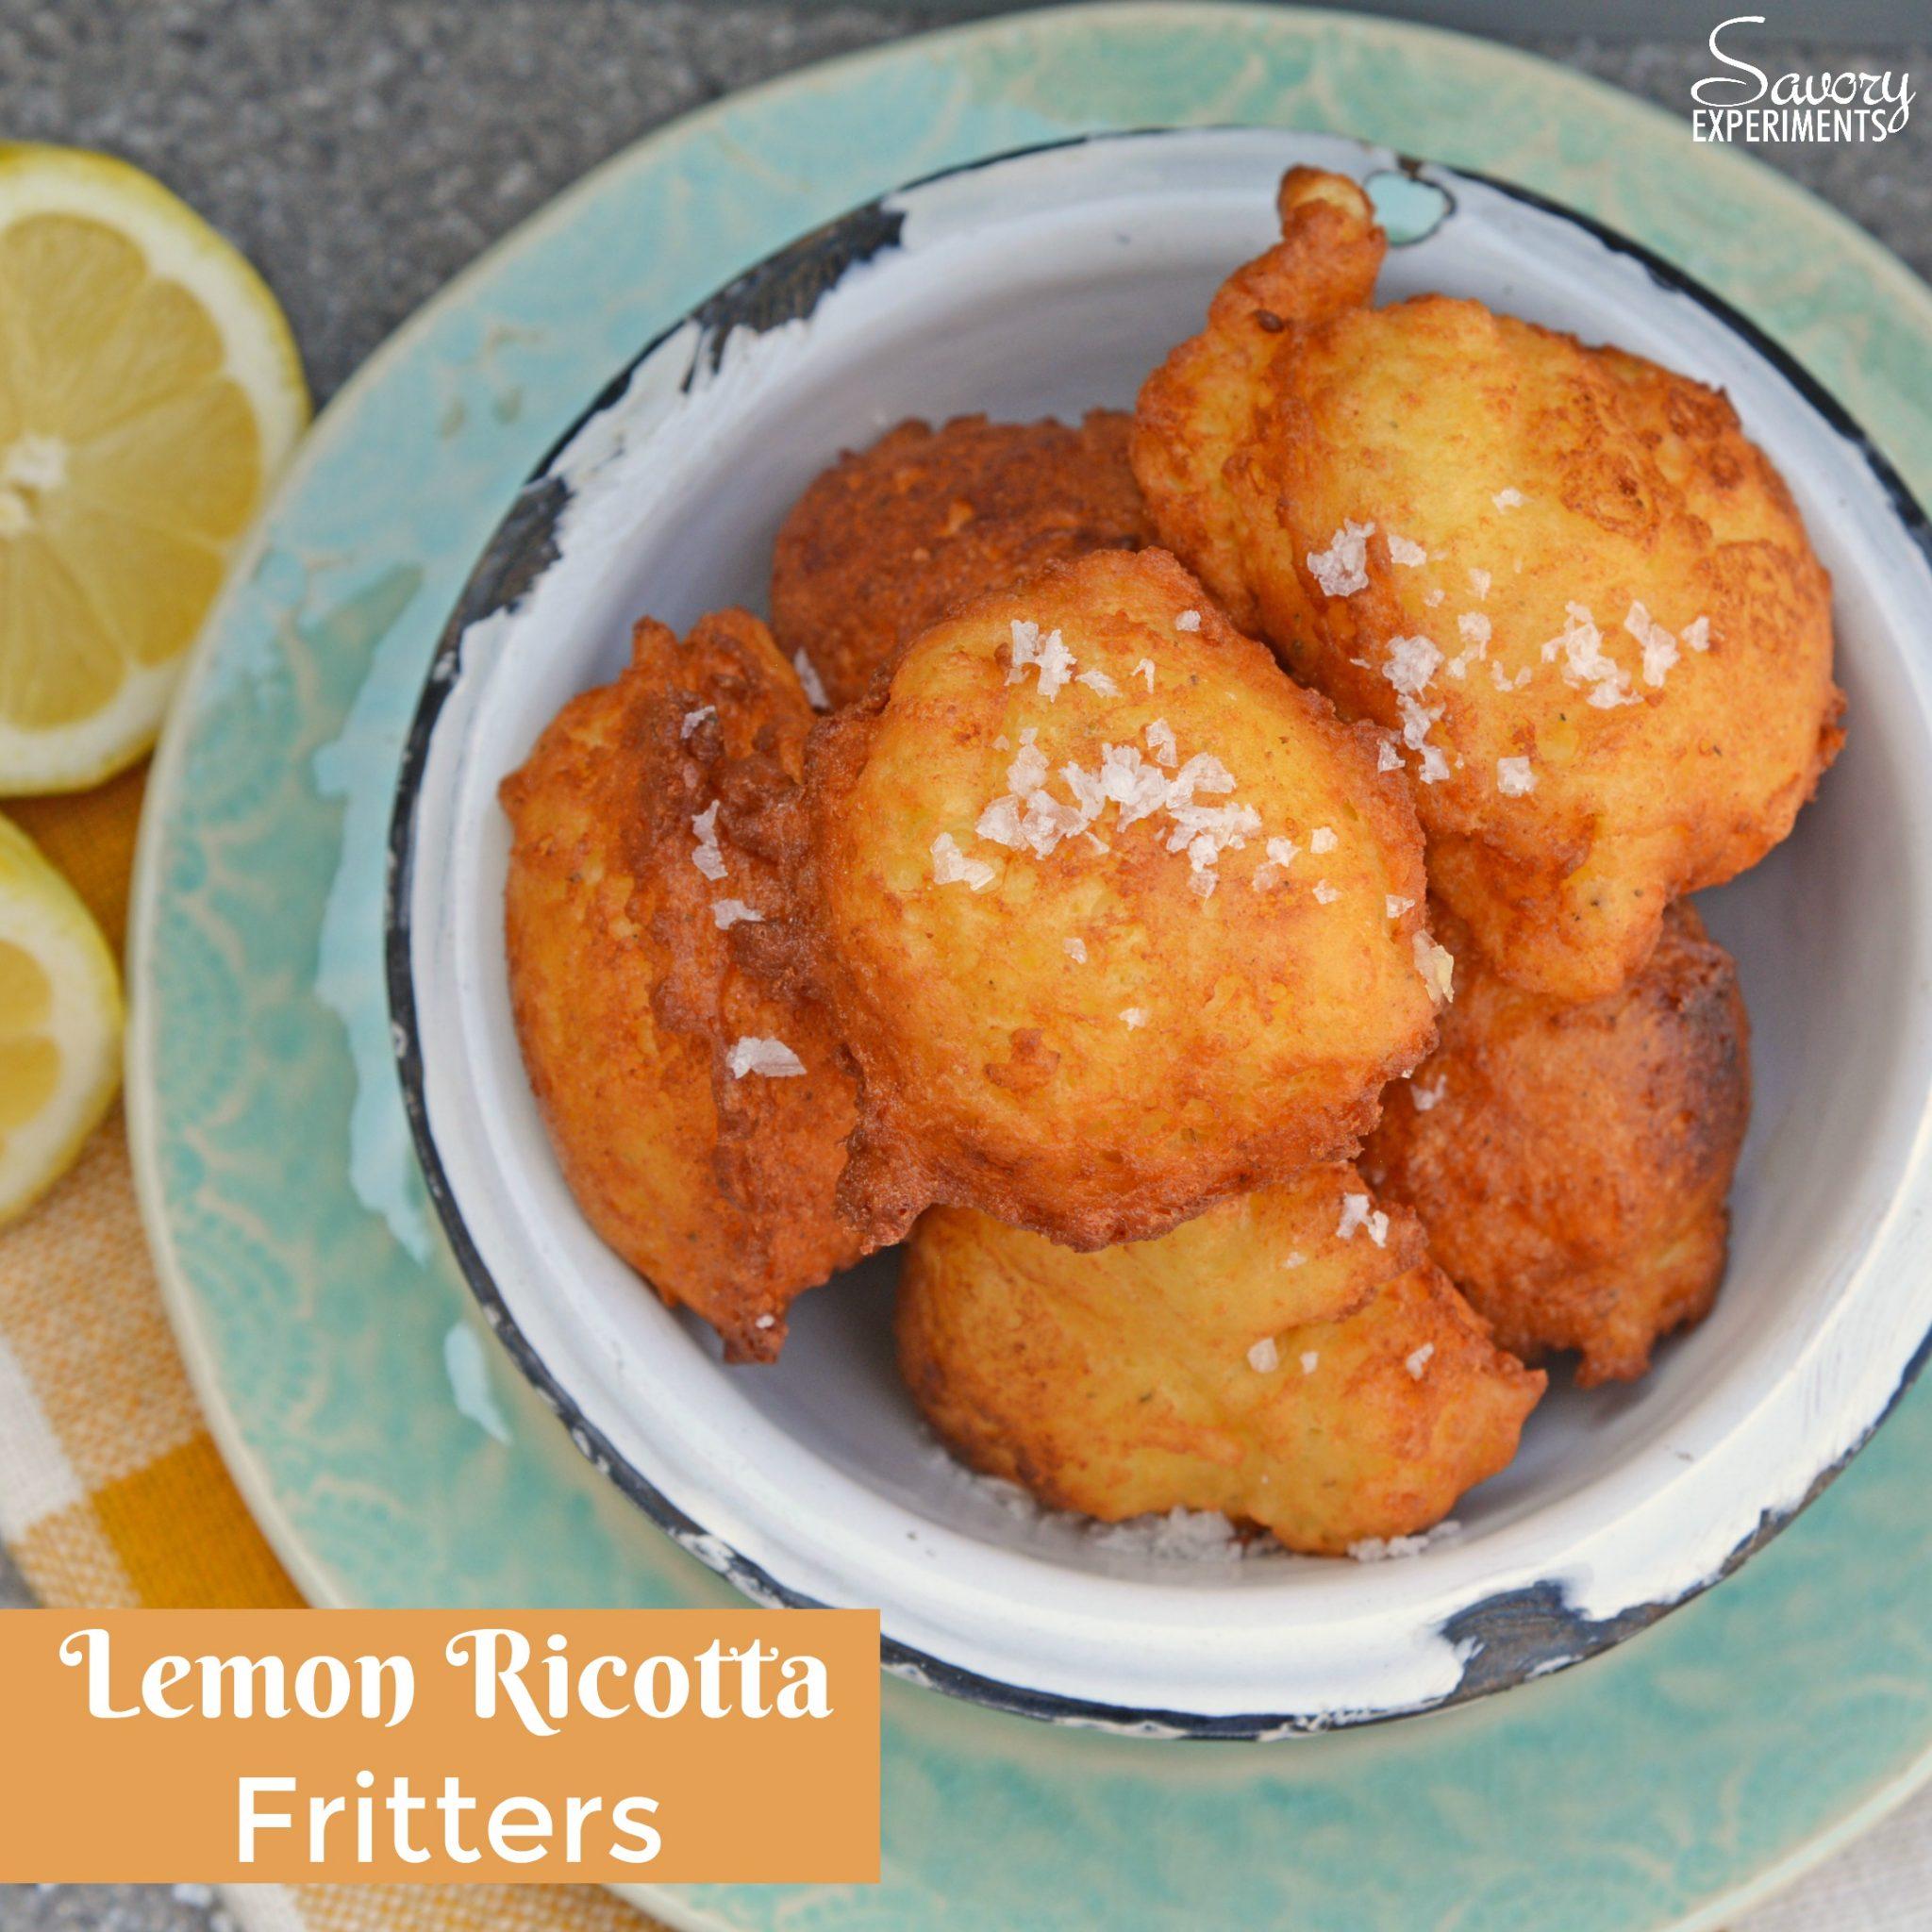 Lemon-Ricotta-Fritters-7 - Maria's Mixing Bowl